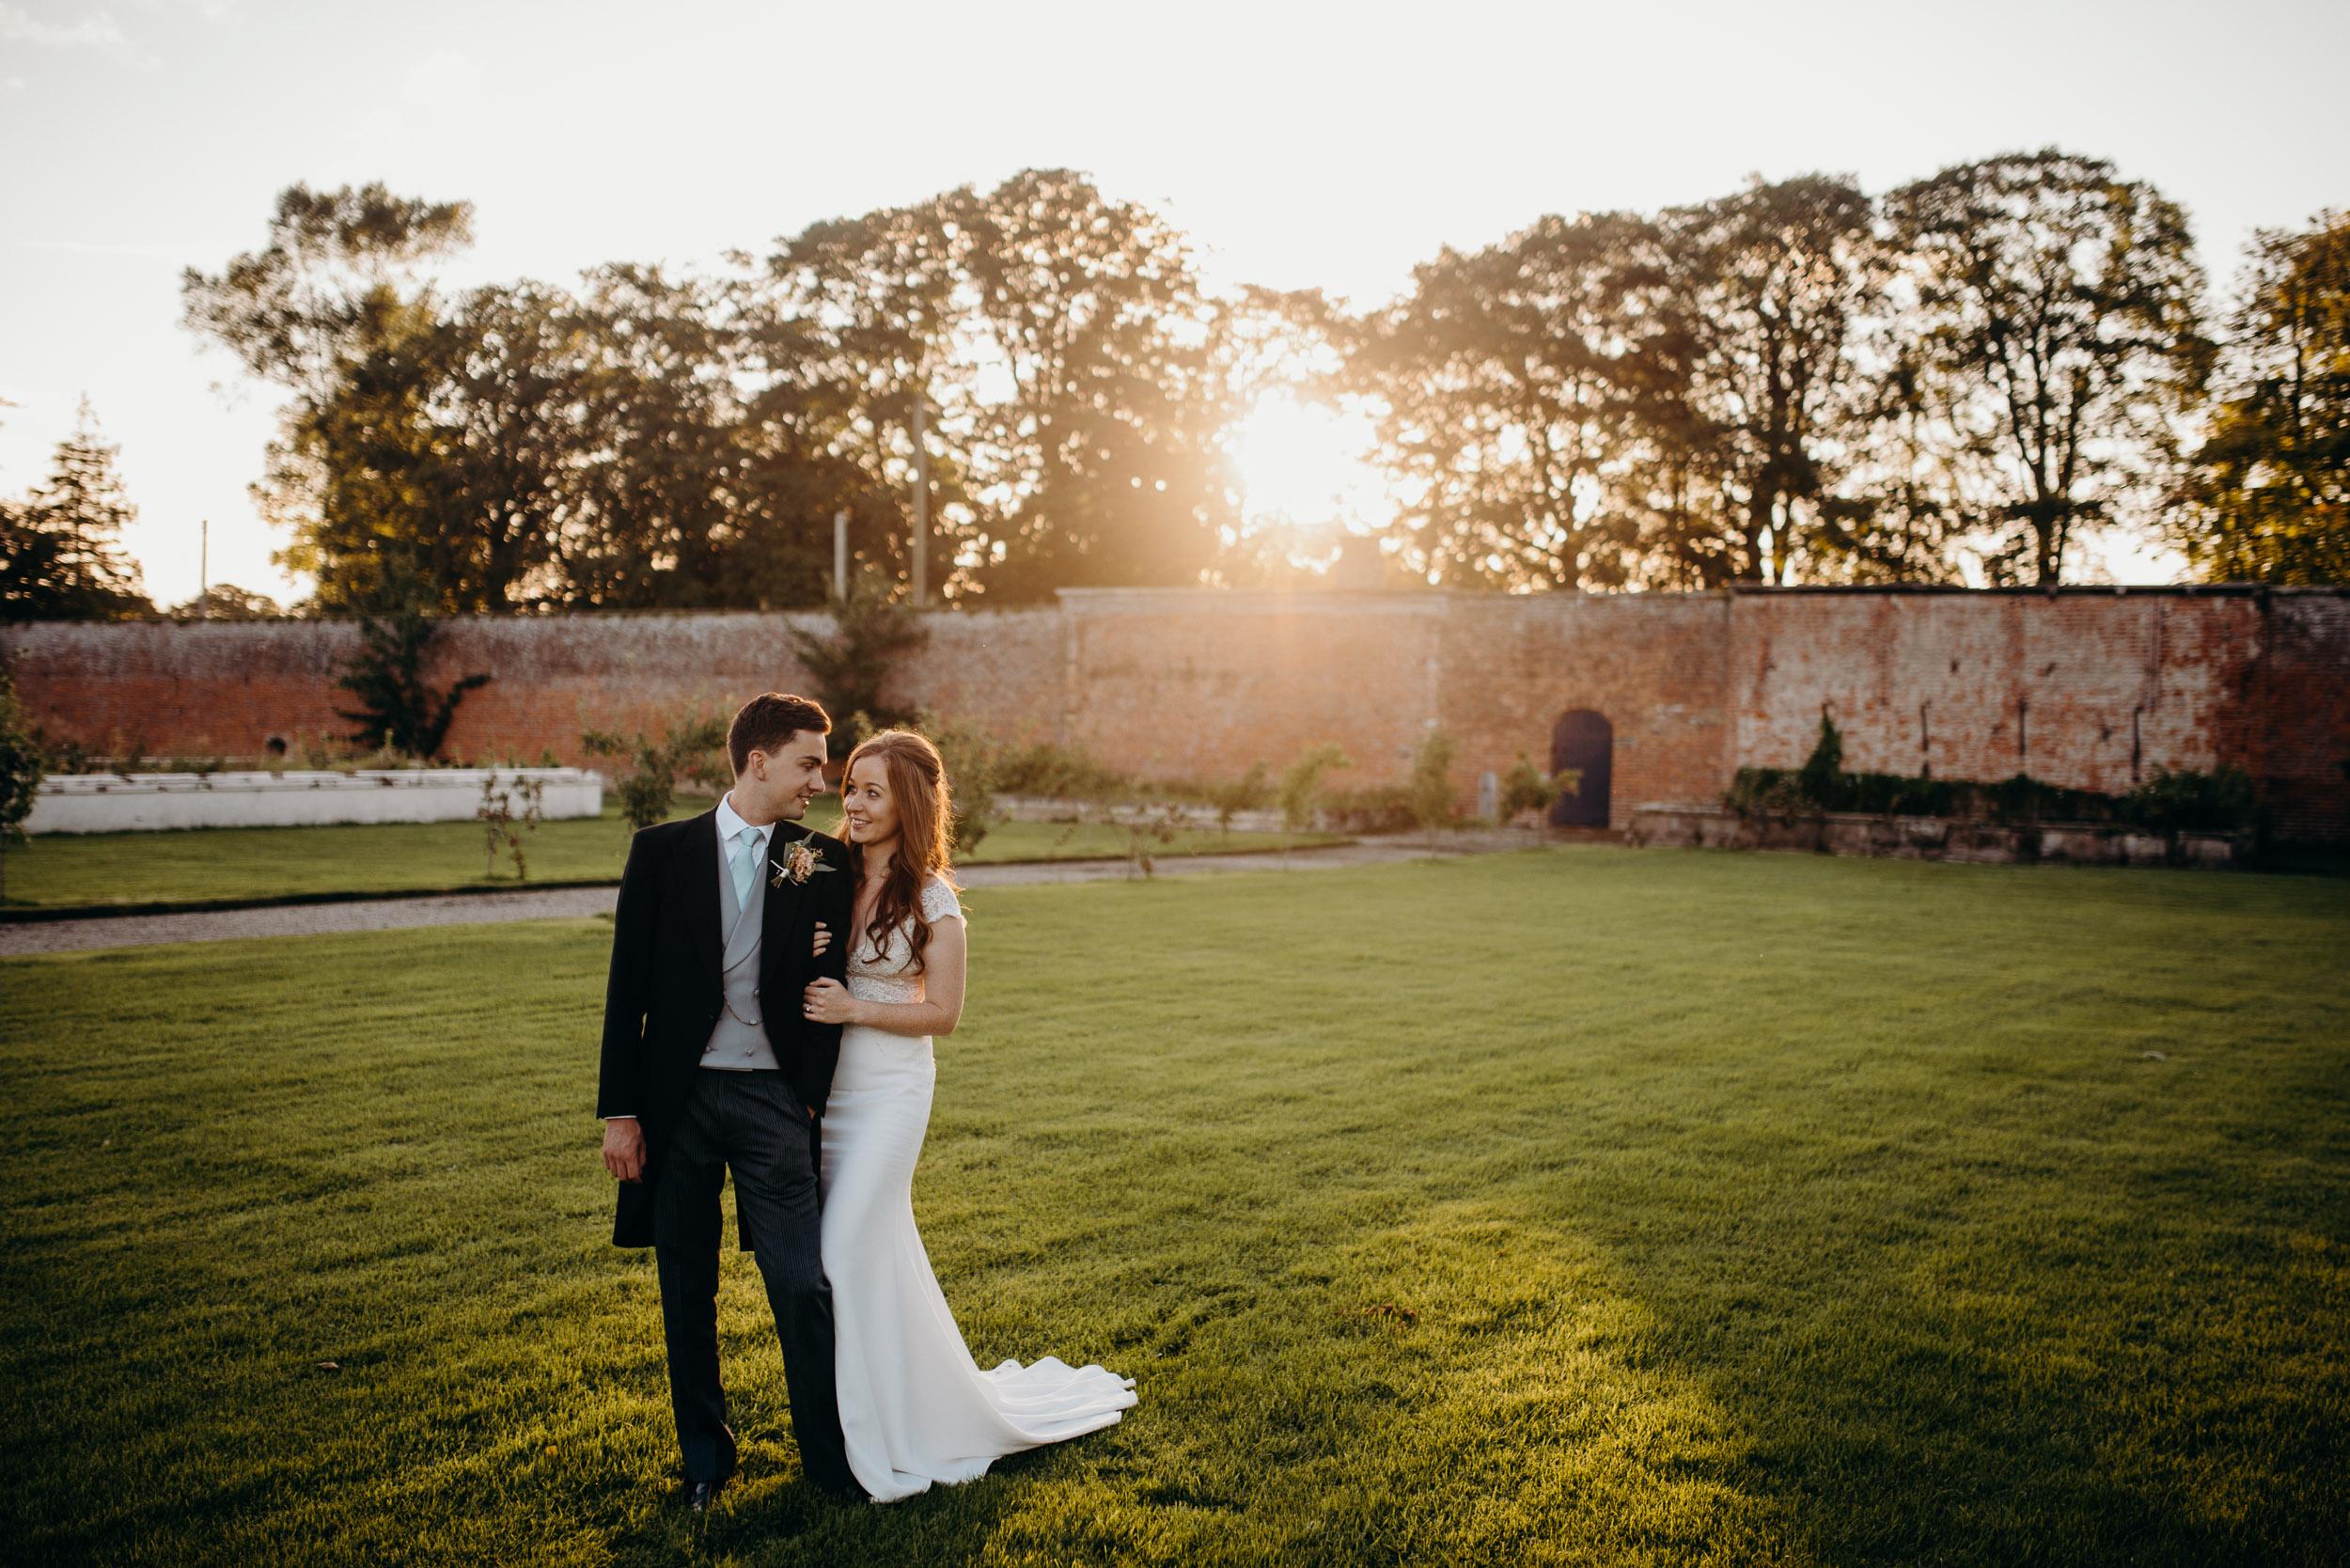 drenagh estate wedding photography-120.jpg